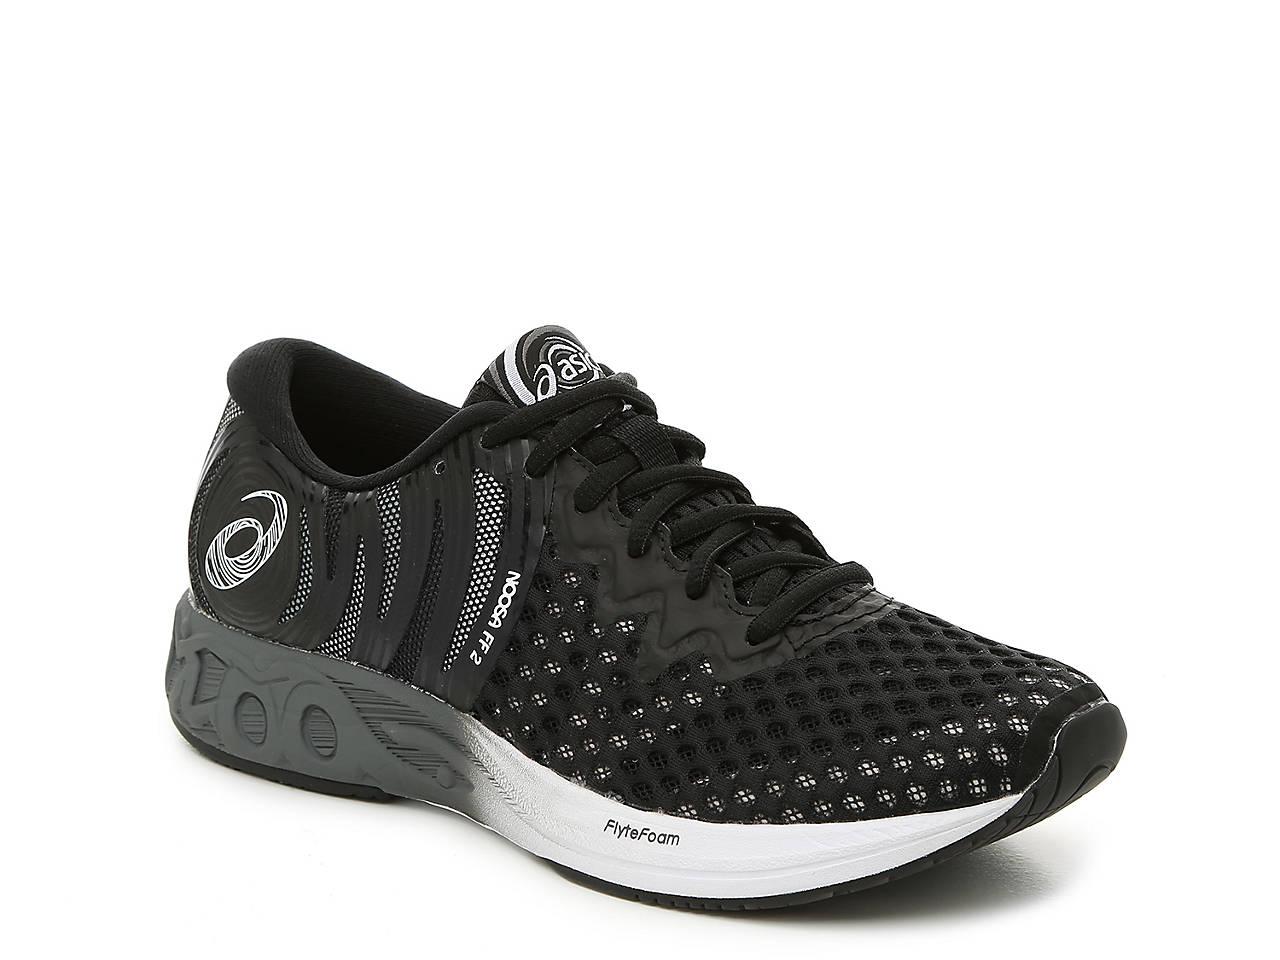 e06aa75846 ASICS Noosa FF 2 Lightweight Running Shoe - Women's Women's Shoes | DSW